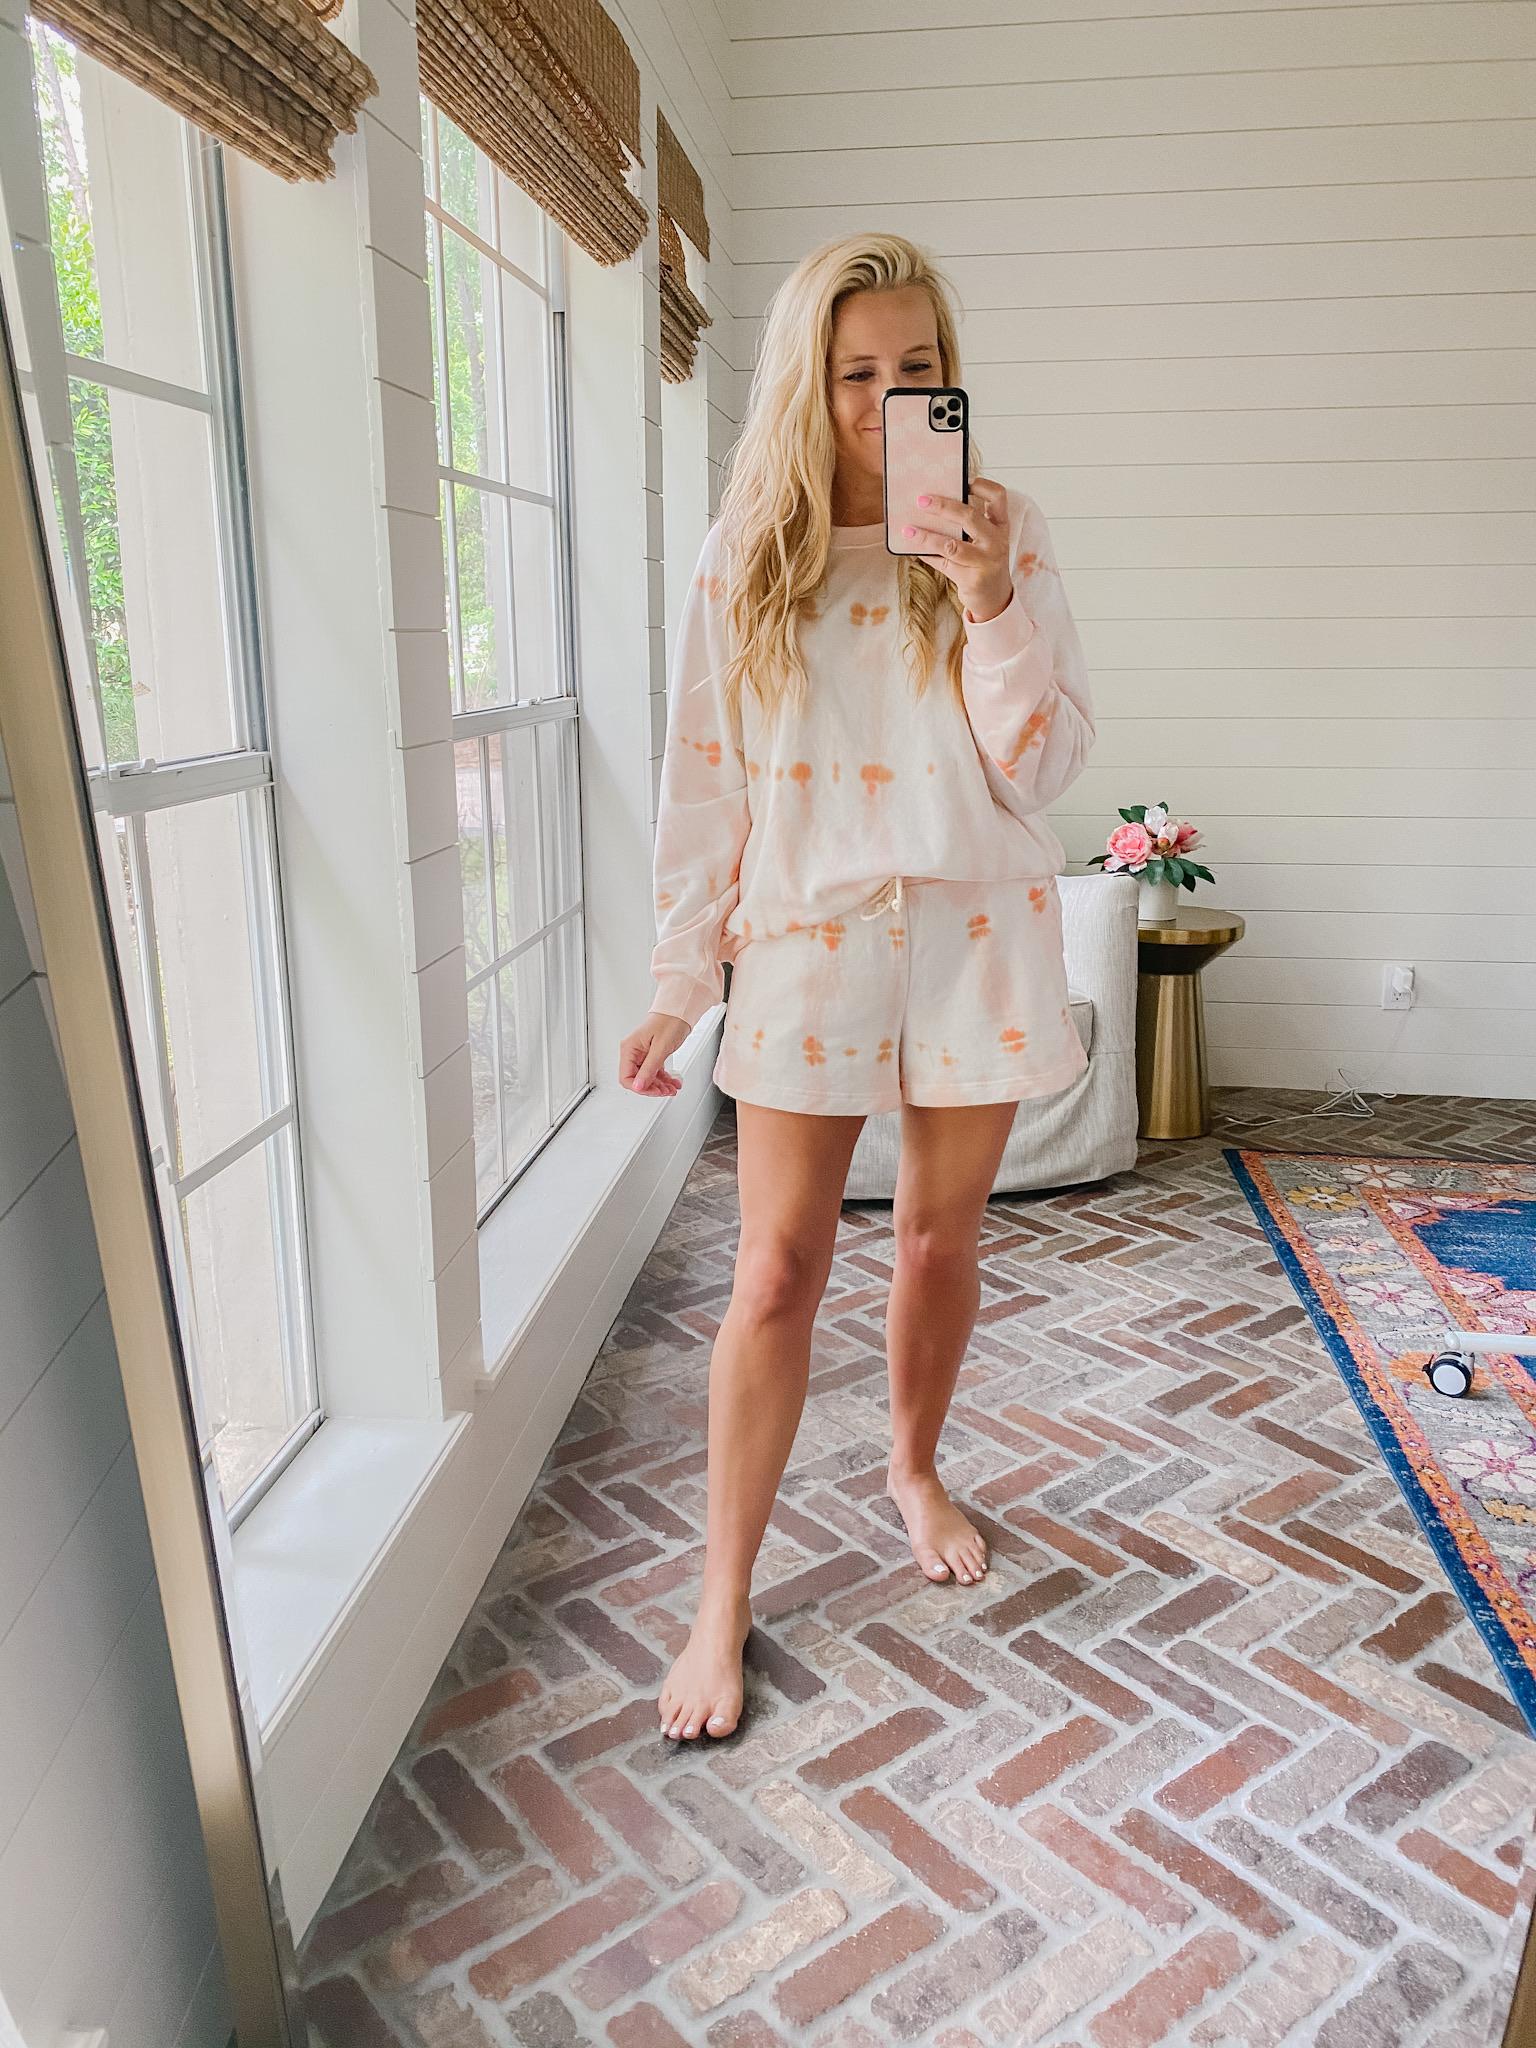 Loft Clothing by popular Houston fashion blog, The House of Fancy: image of a woman wearing a Loft orange and pink tie dye loungewear set.